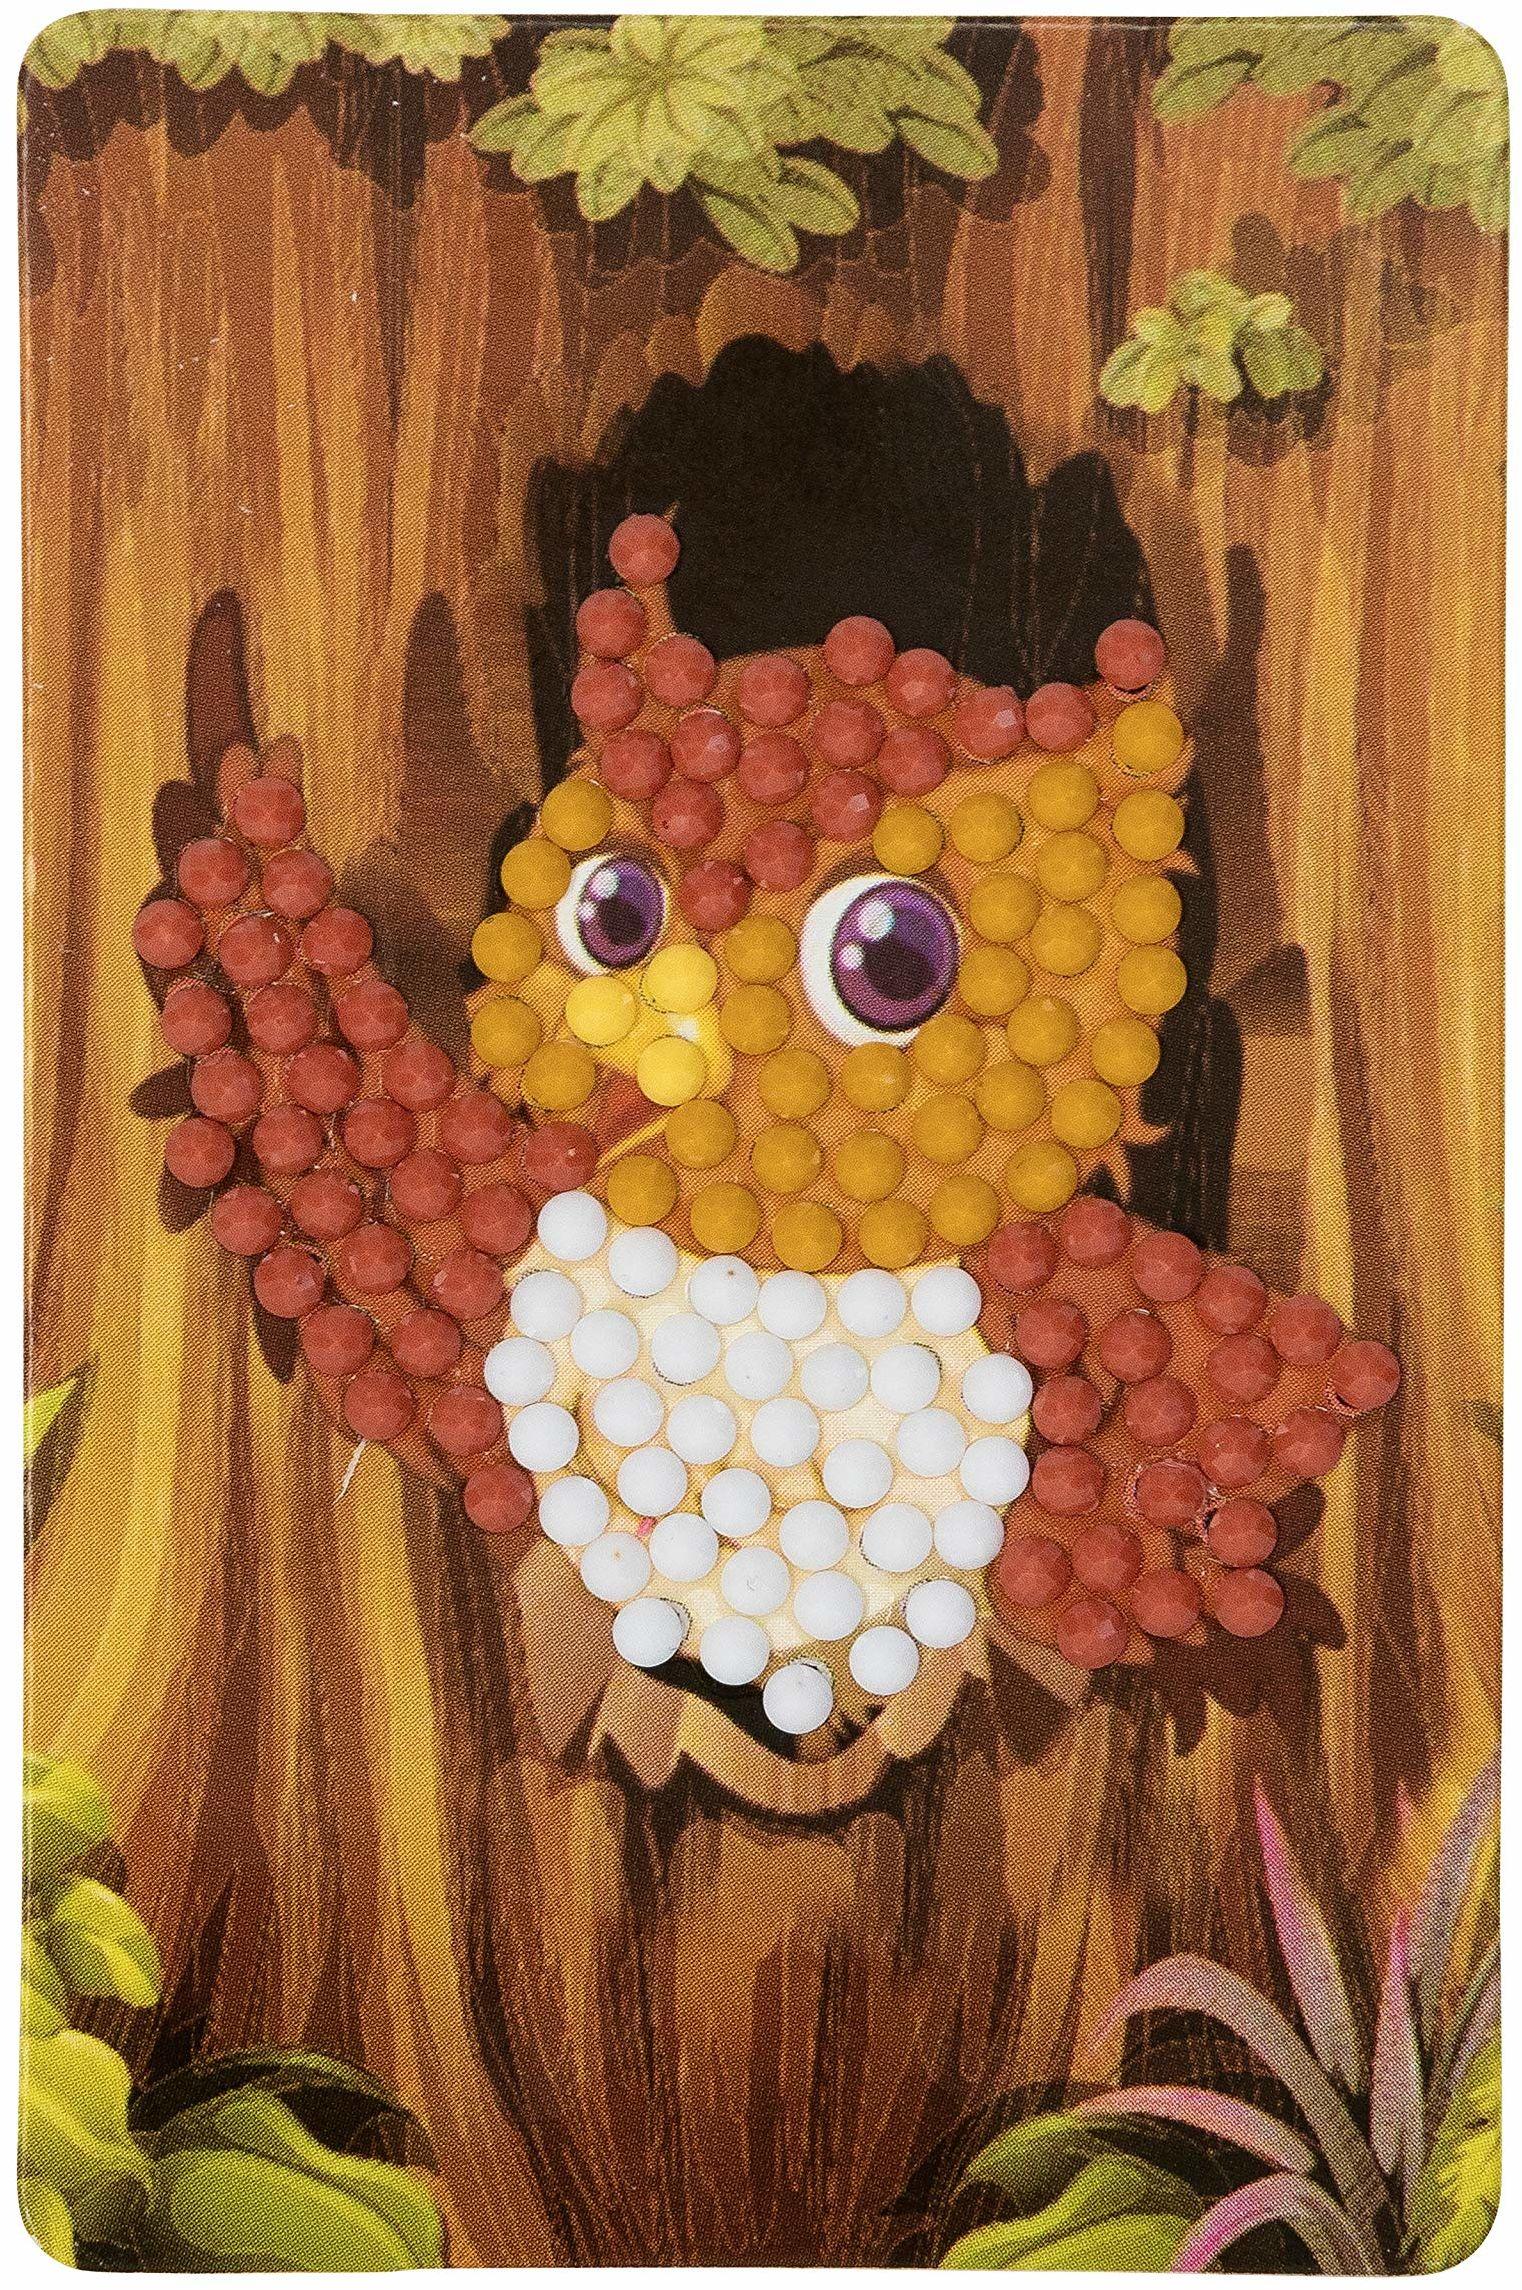 Crystal Art CCK-M&T2 Crystal Card Tester Kits 8,5 x 5,5 cm, Multicolor